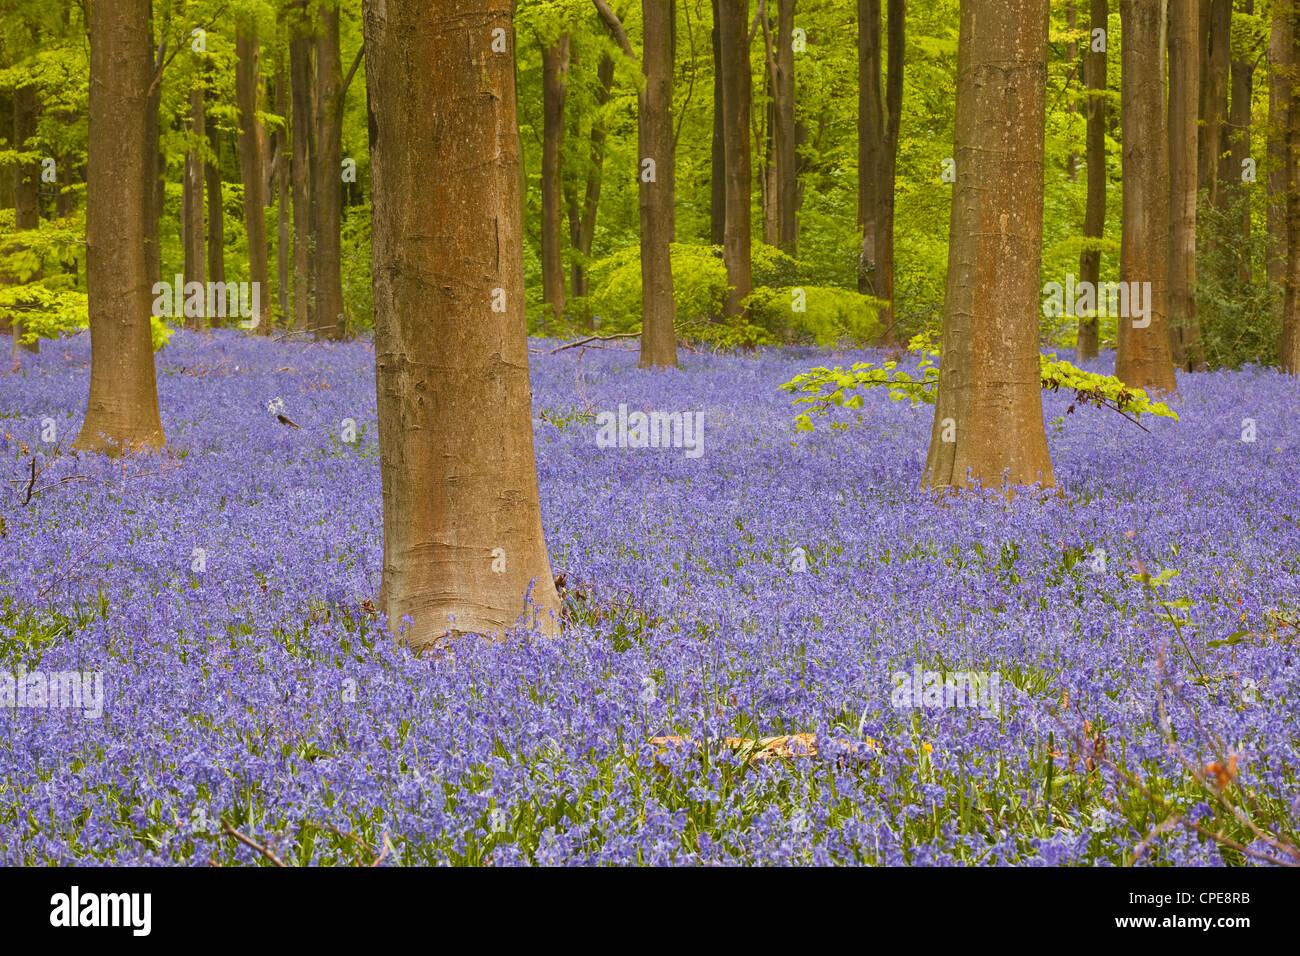 Bluebells beneath trees, West Woods, Wiltshire, England, United Kingdom, Europe Stock Photo